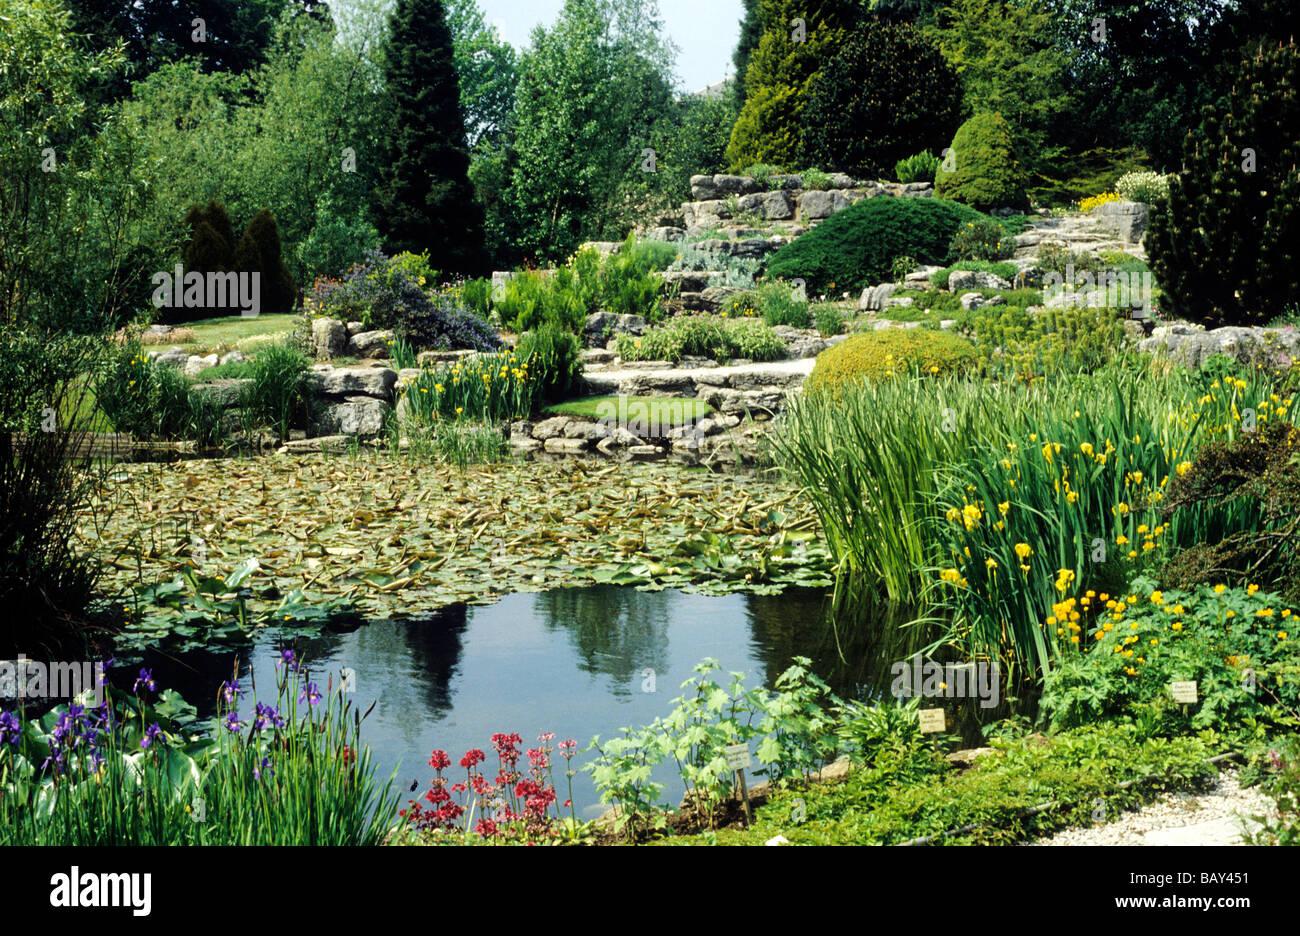 Cambridge botanical gardens garden water ponds plants for Garden pond plants uk